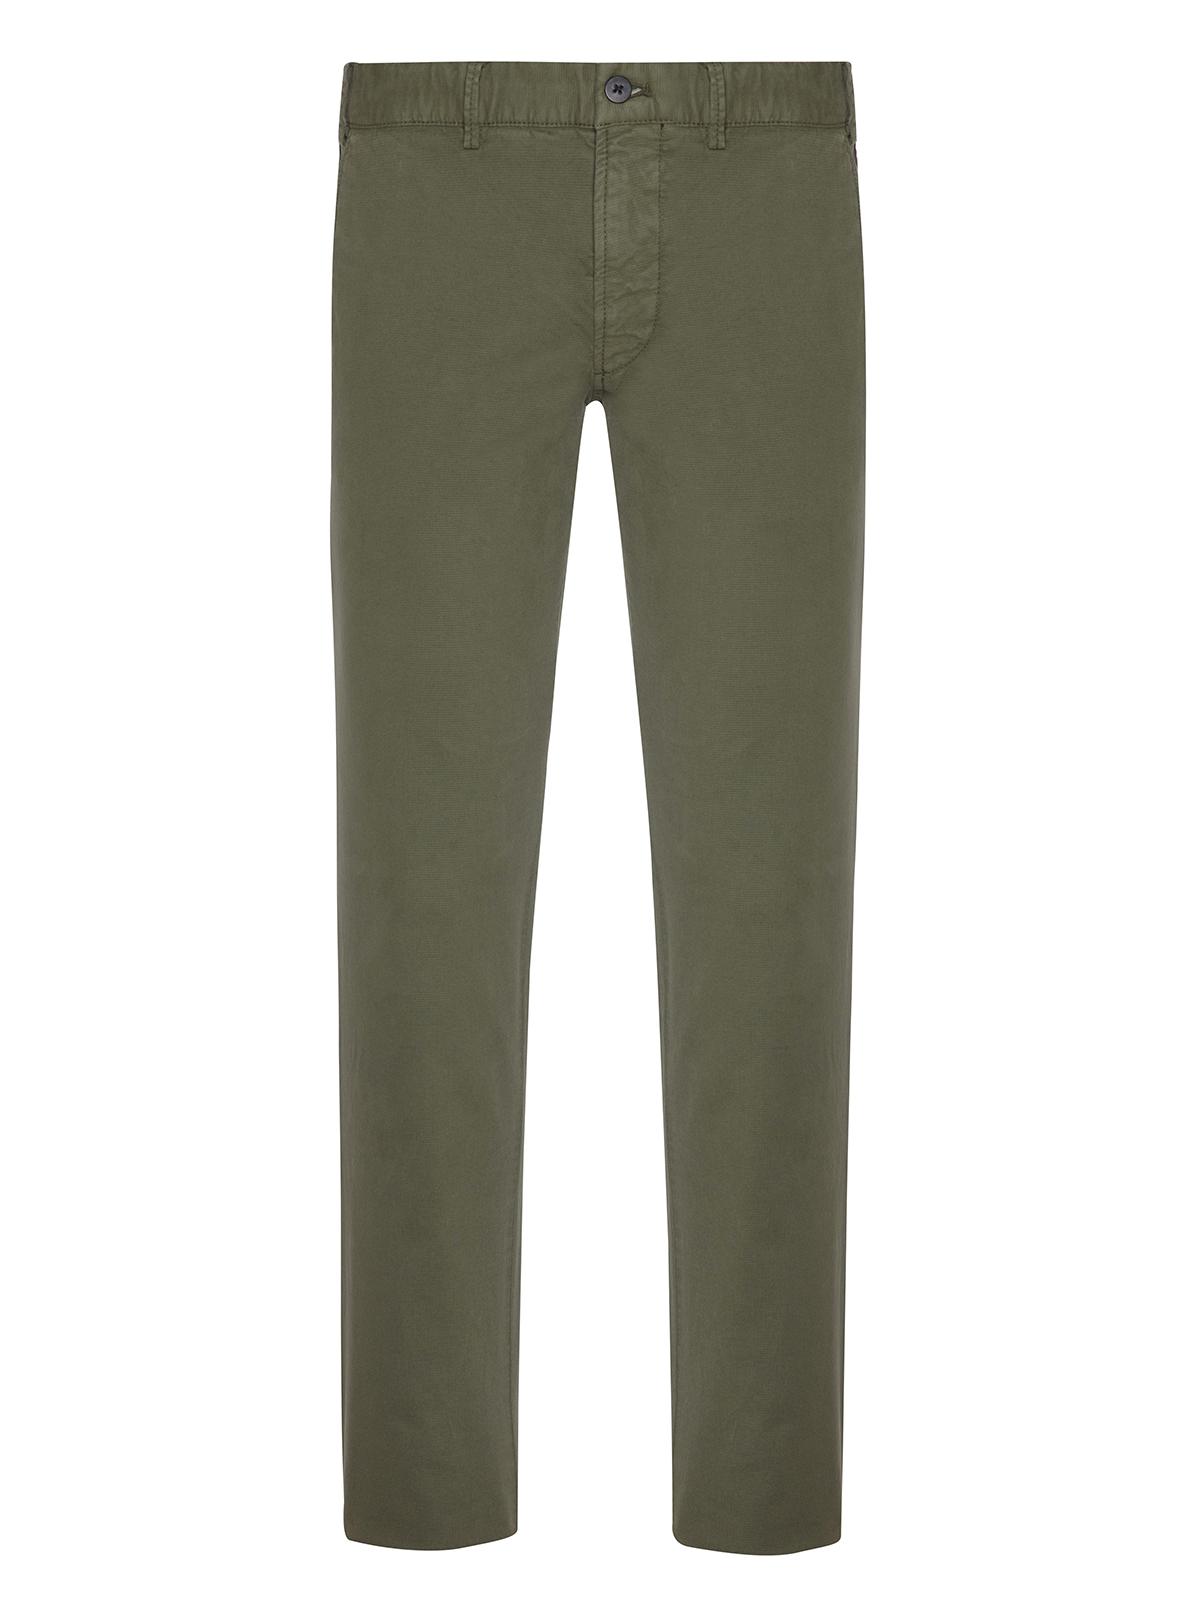 Hiltl - Hiltl Rugged Motion Coton Elastane Yeşil Stretch Tiago Chino Slim Fit Pantolon